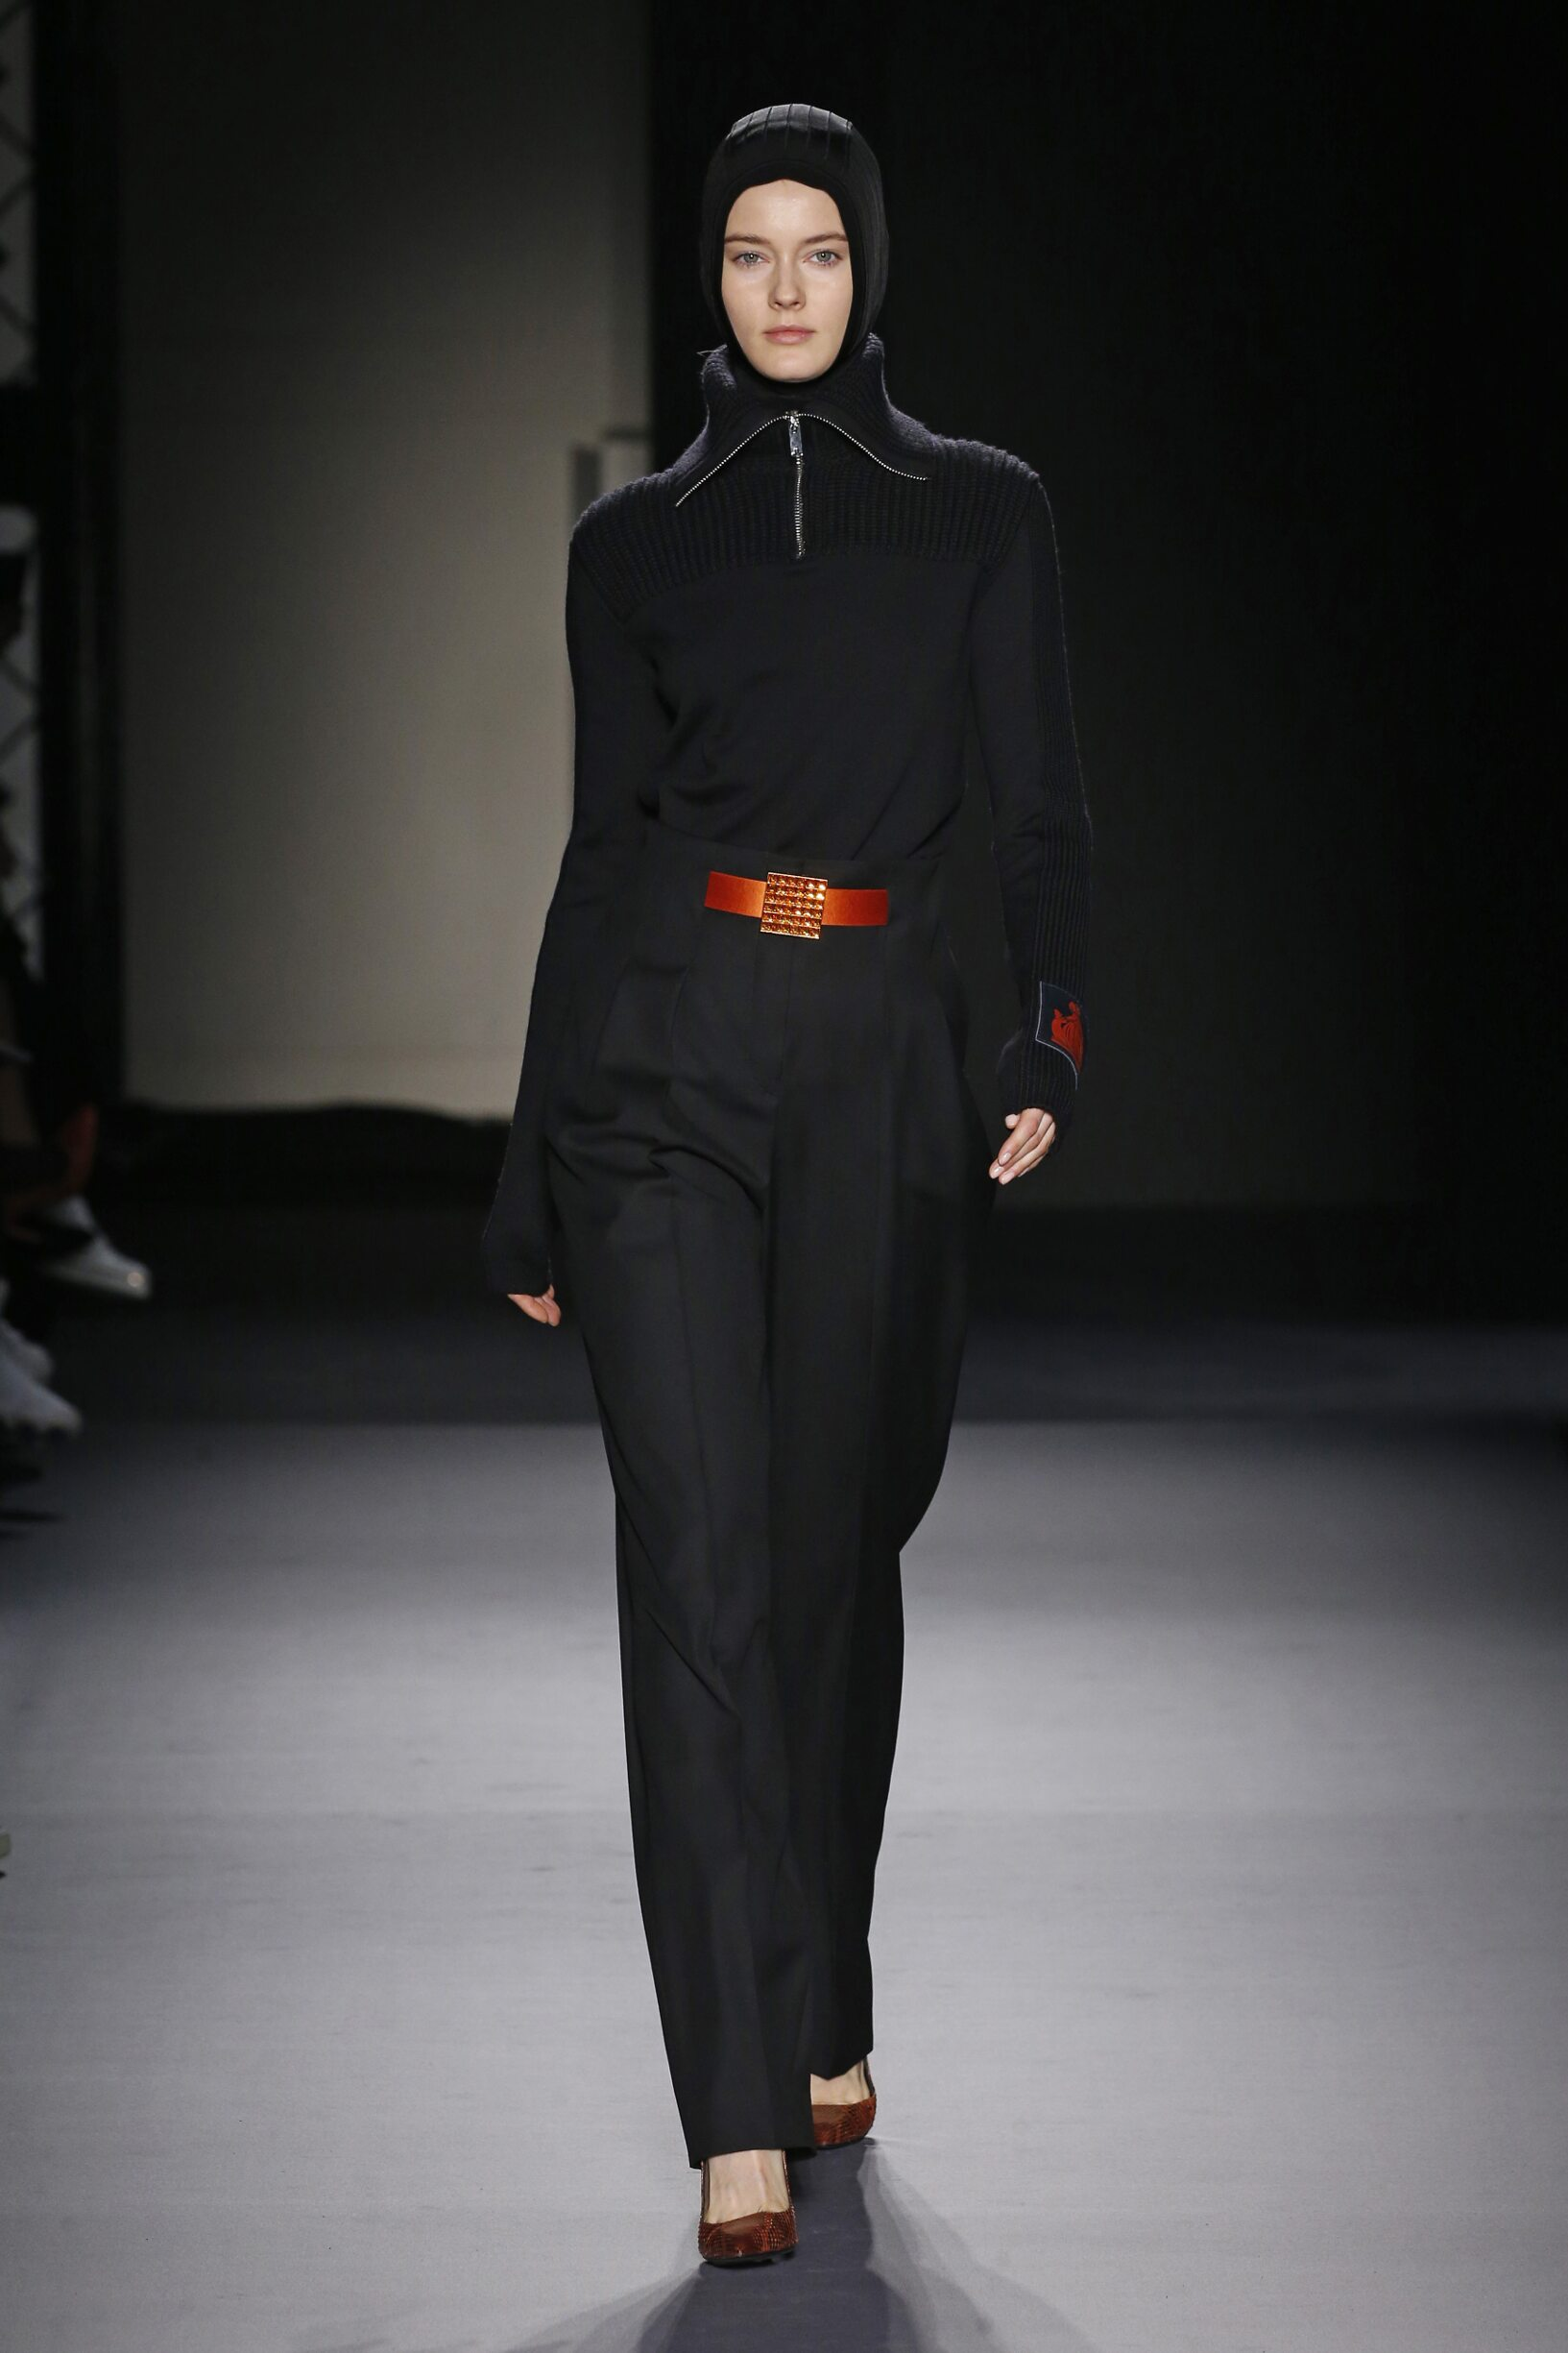 Catwalk Lanvin Woman Fashion Show Winter 2018